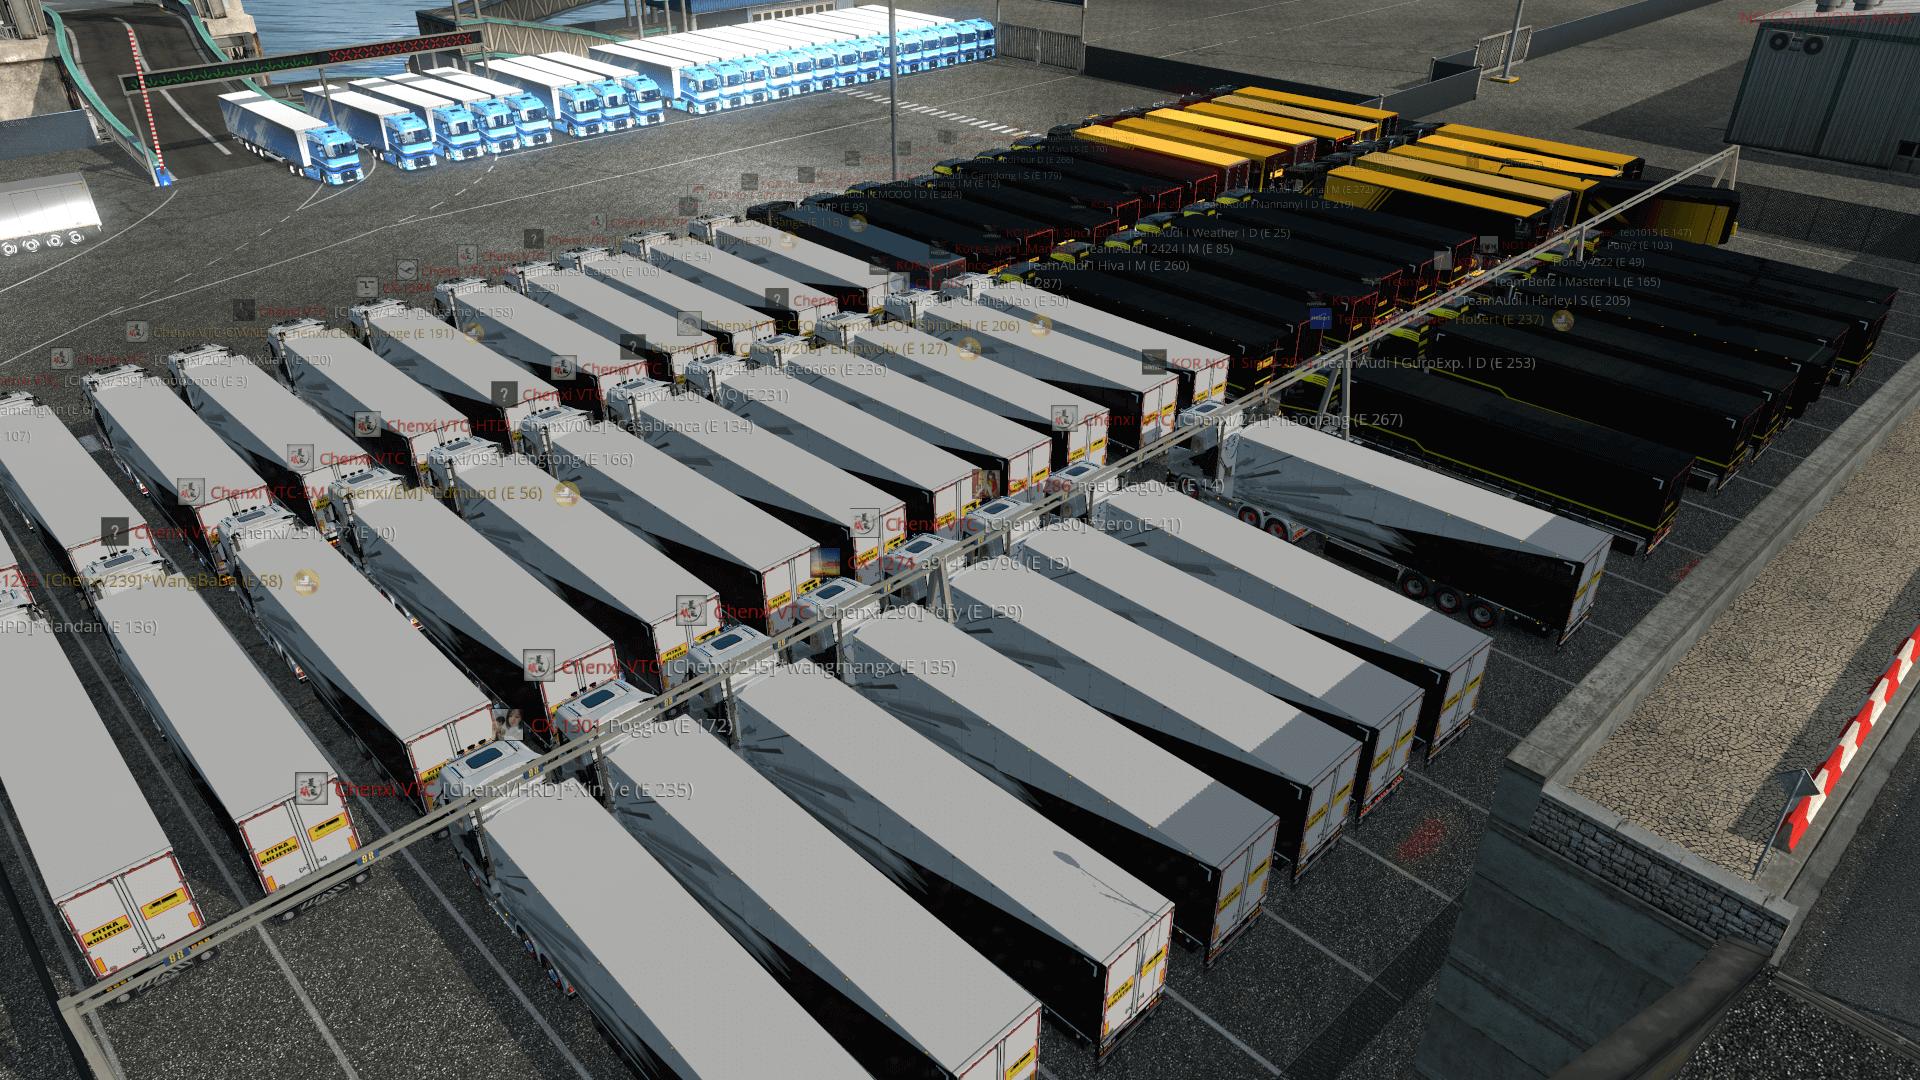 TeamAudi 5th Anniversary Convoy   2019. 12. 08